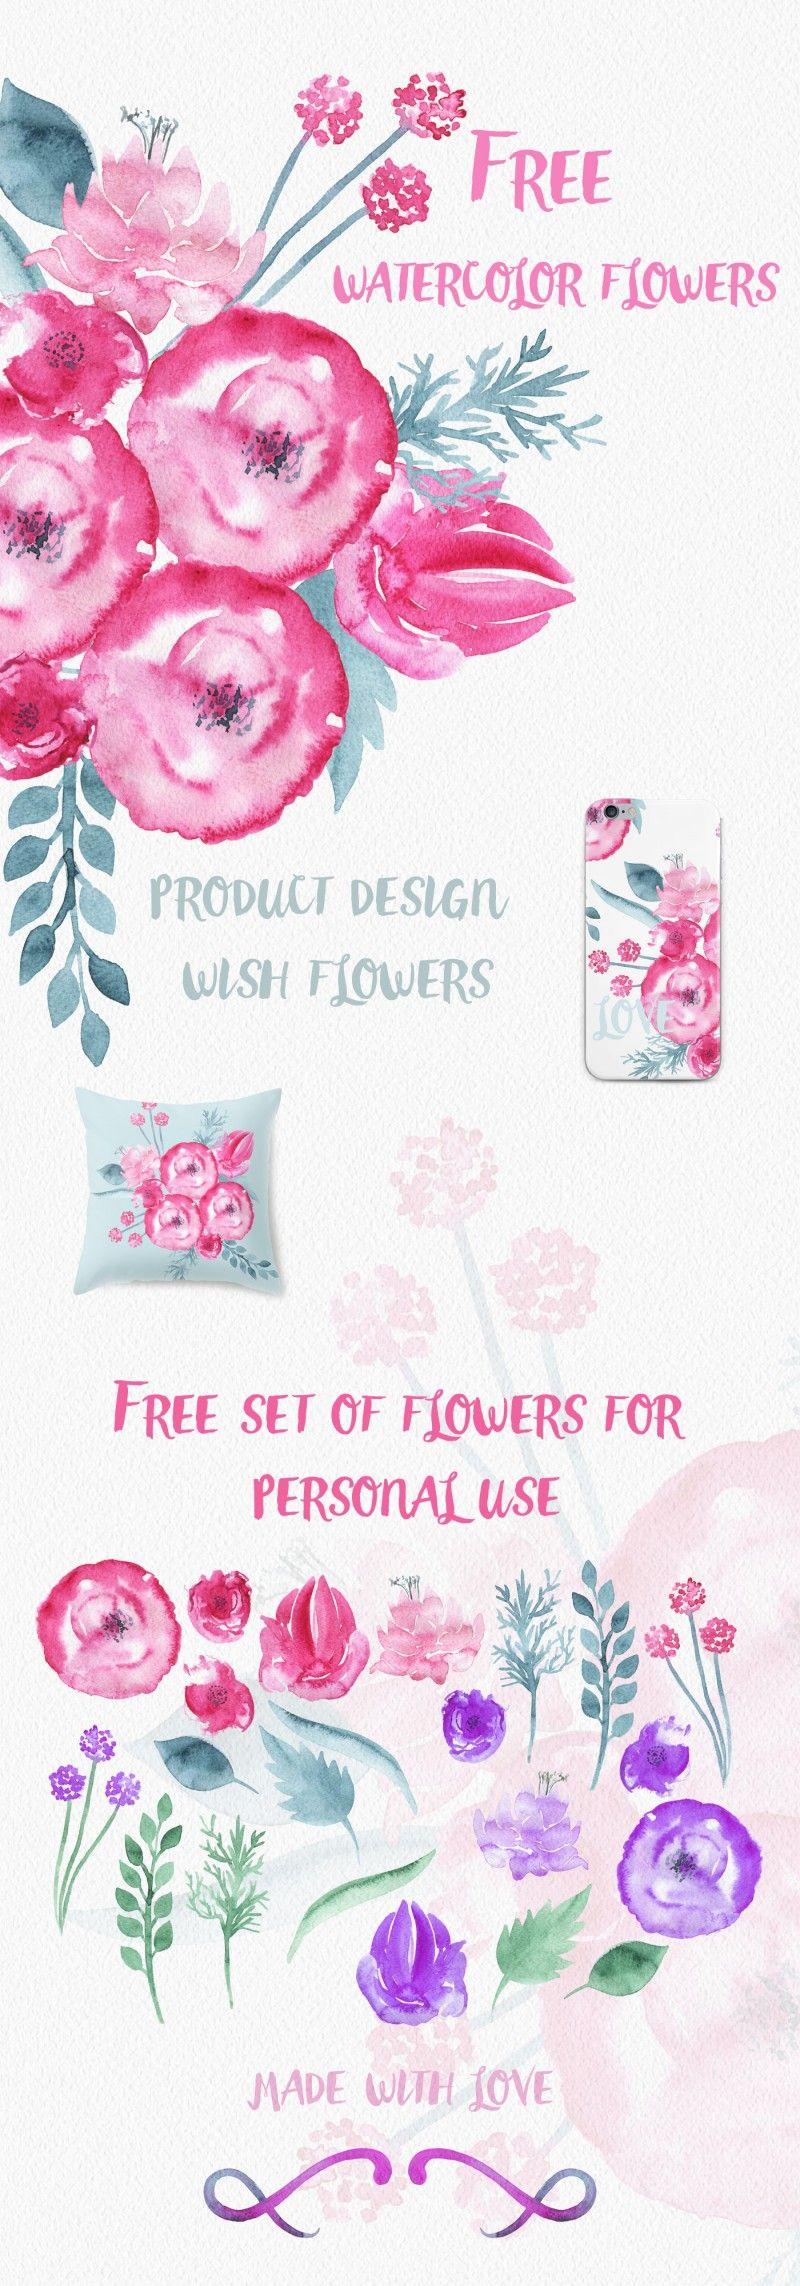 Free Watercolor Flowers ღ DIY Logo Icon ღ Pinterest